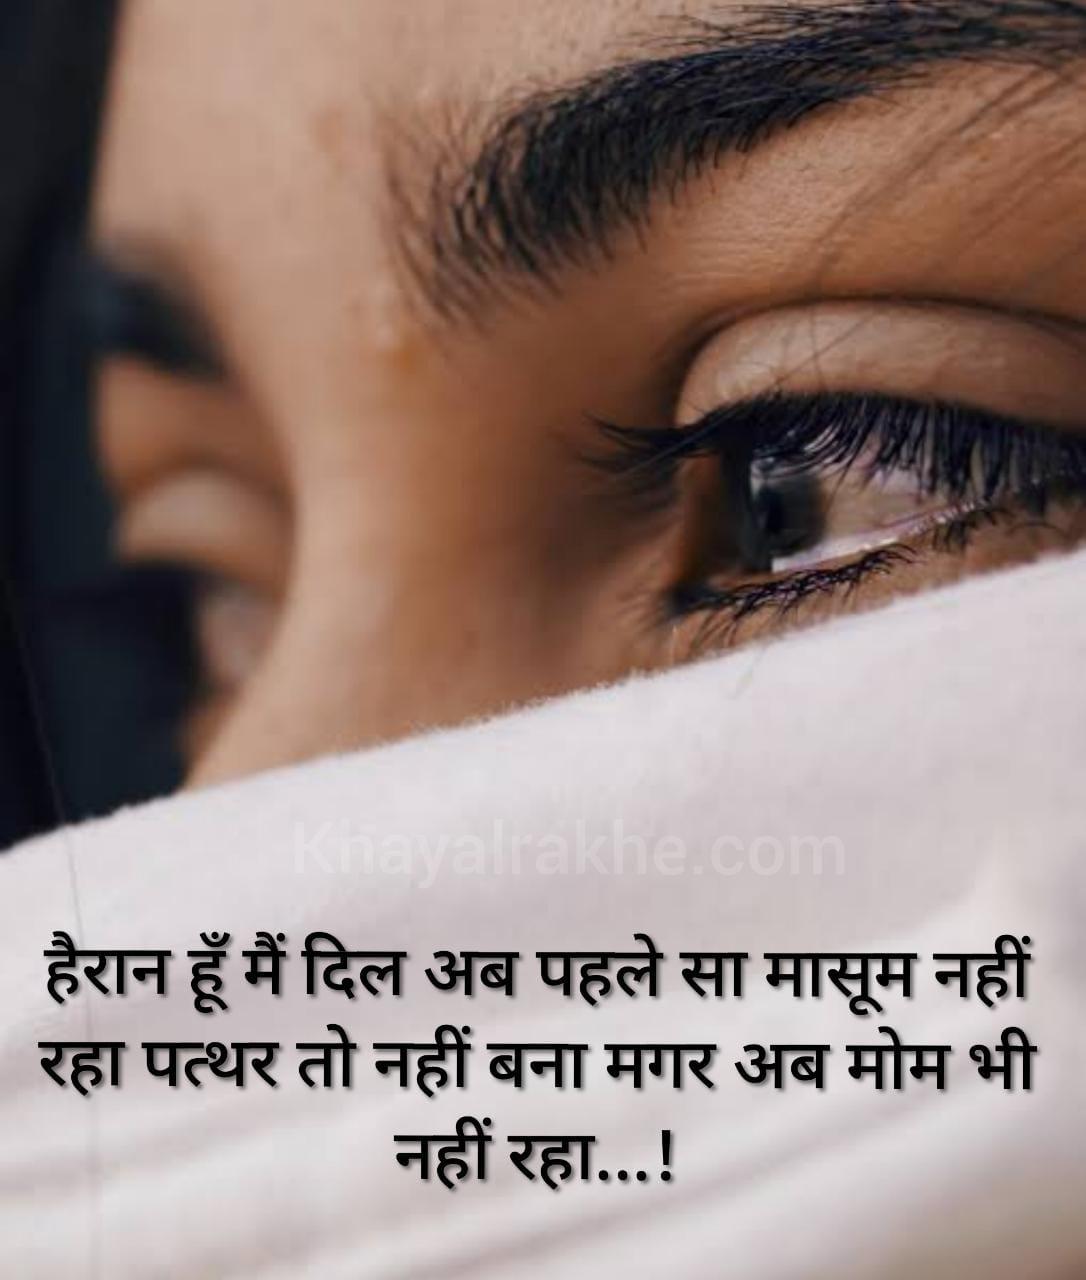 Sad Hindi Status On Life For Whatsapp or Facebook